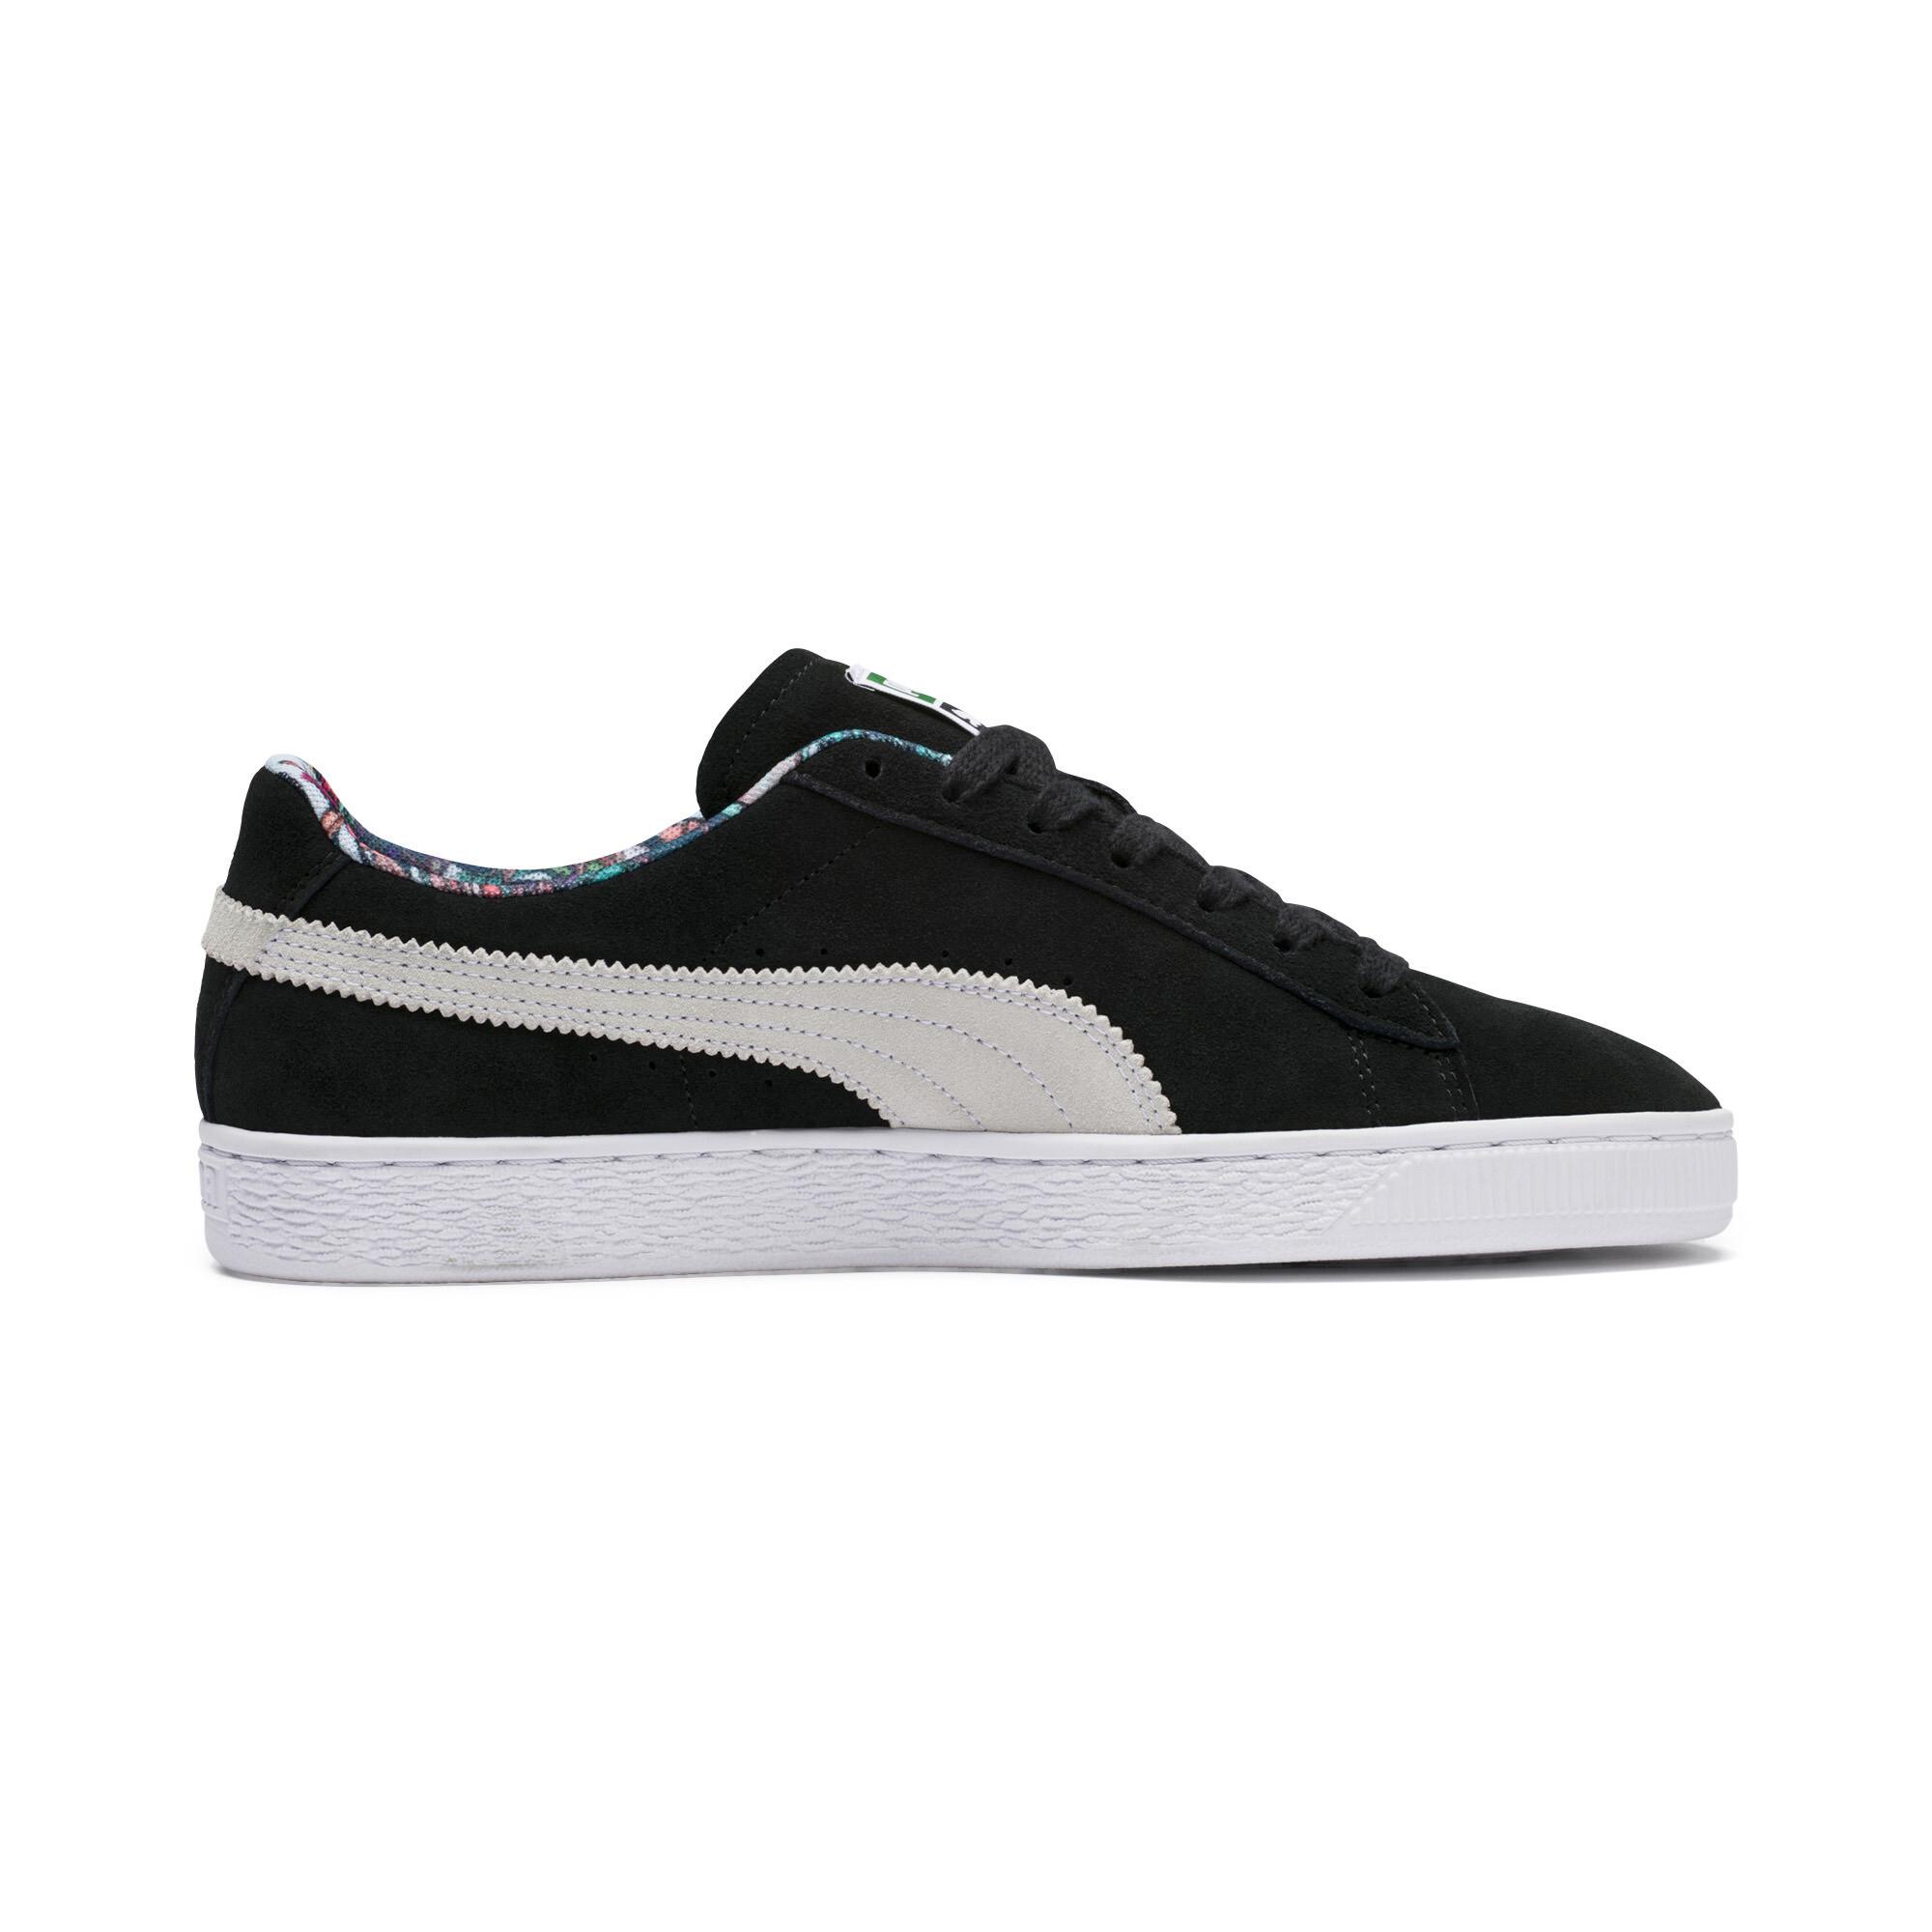 Image Puma Suede Secret Garden Sneakers #5